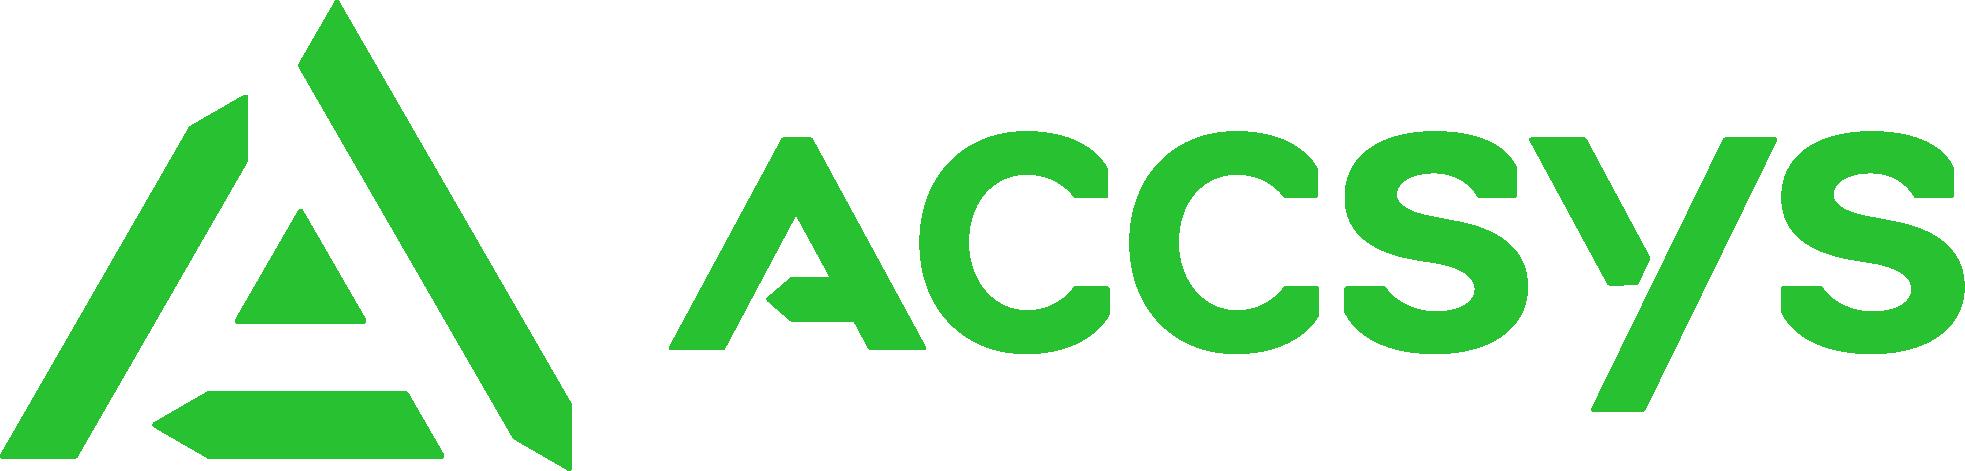 Accsys Technologies Plc Logo